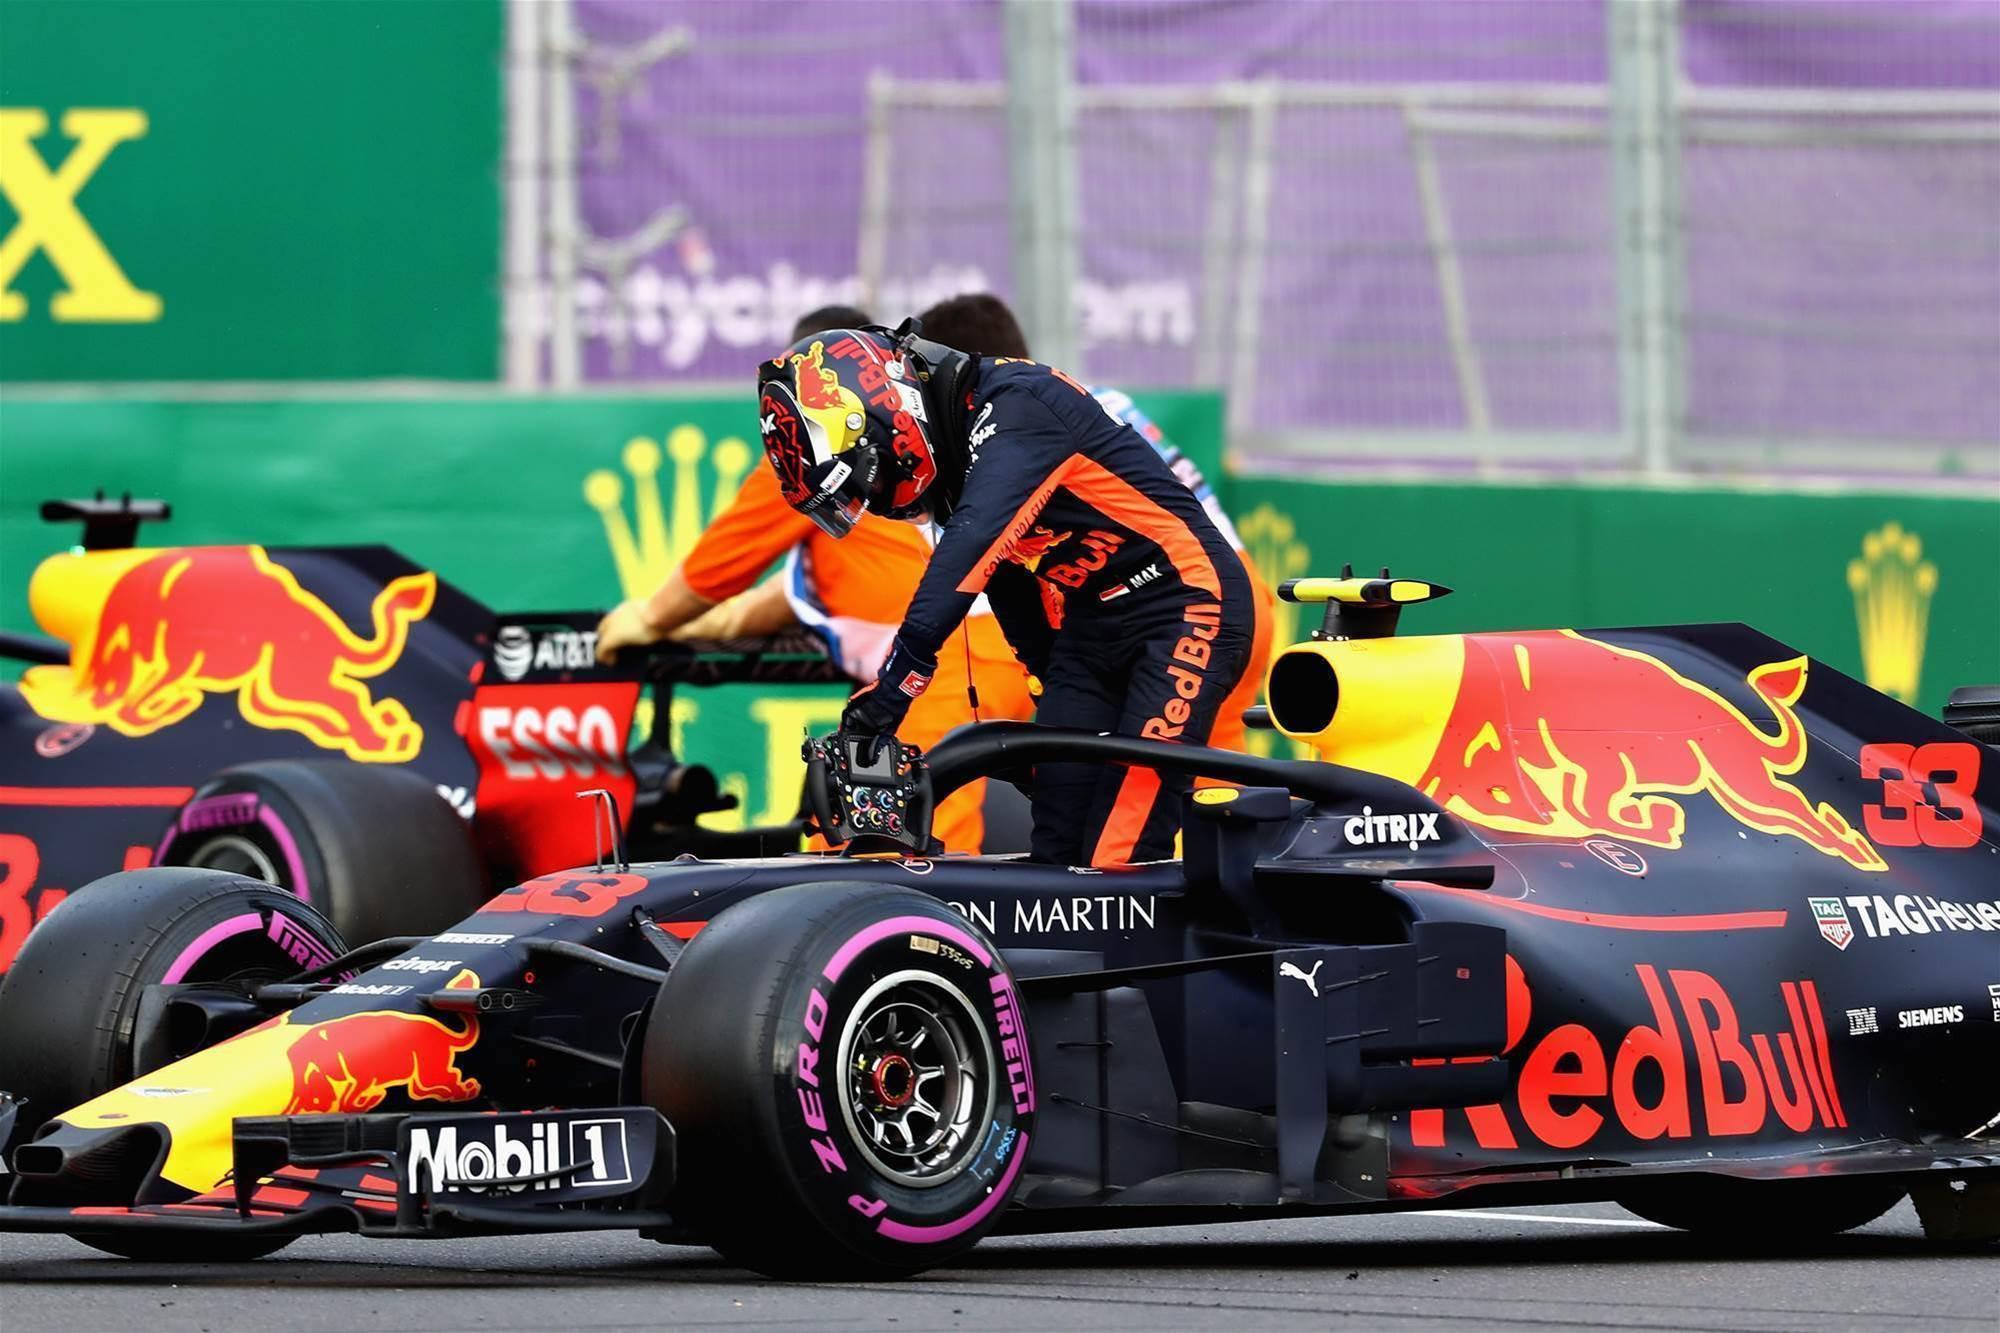 Verstappen and Ricciardo both to blame: FIA